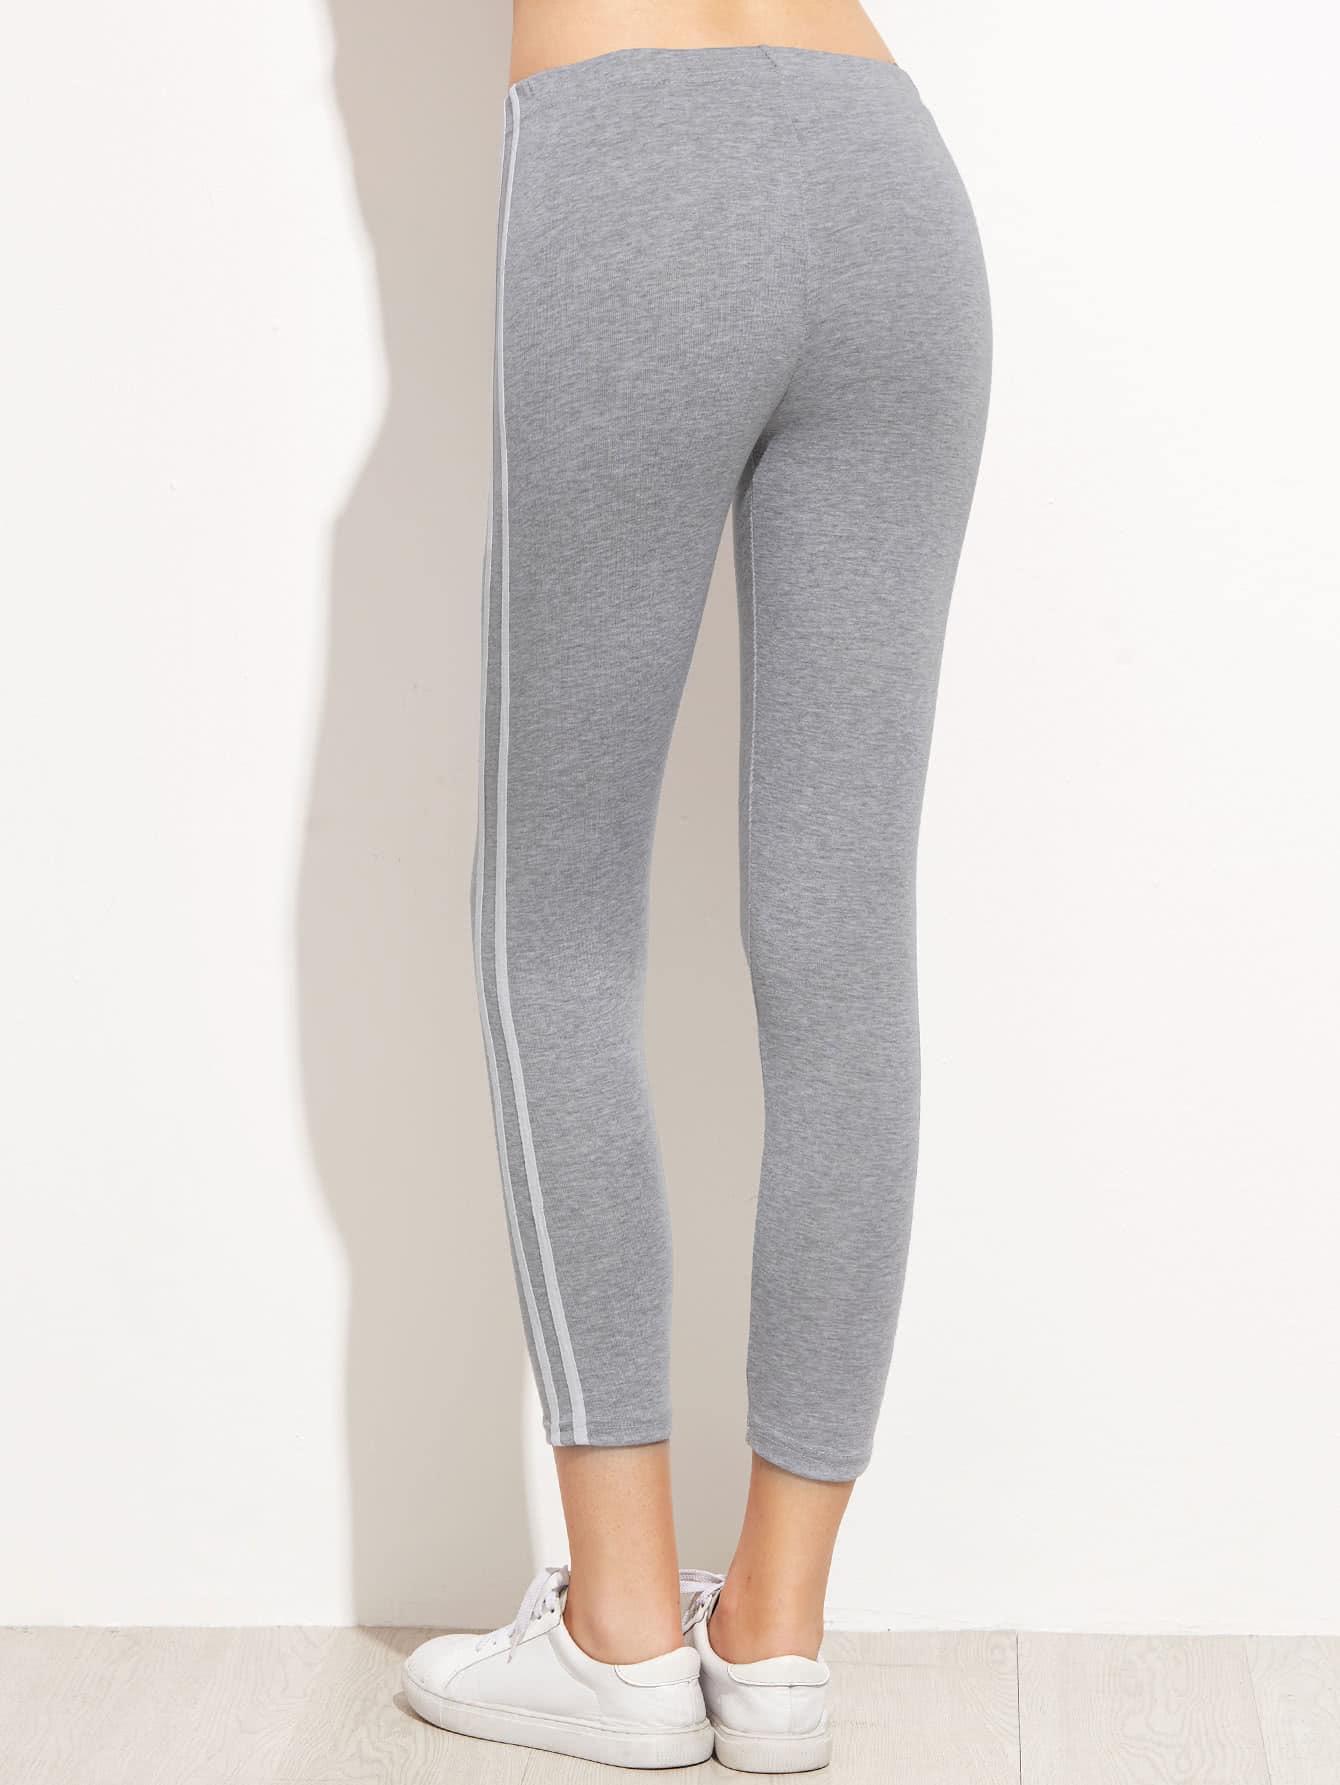 Grey Striped Side Leggings